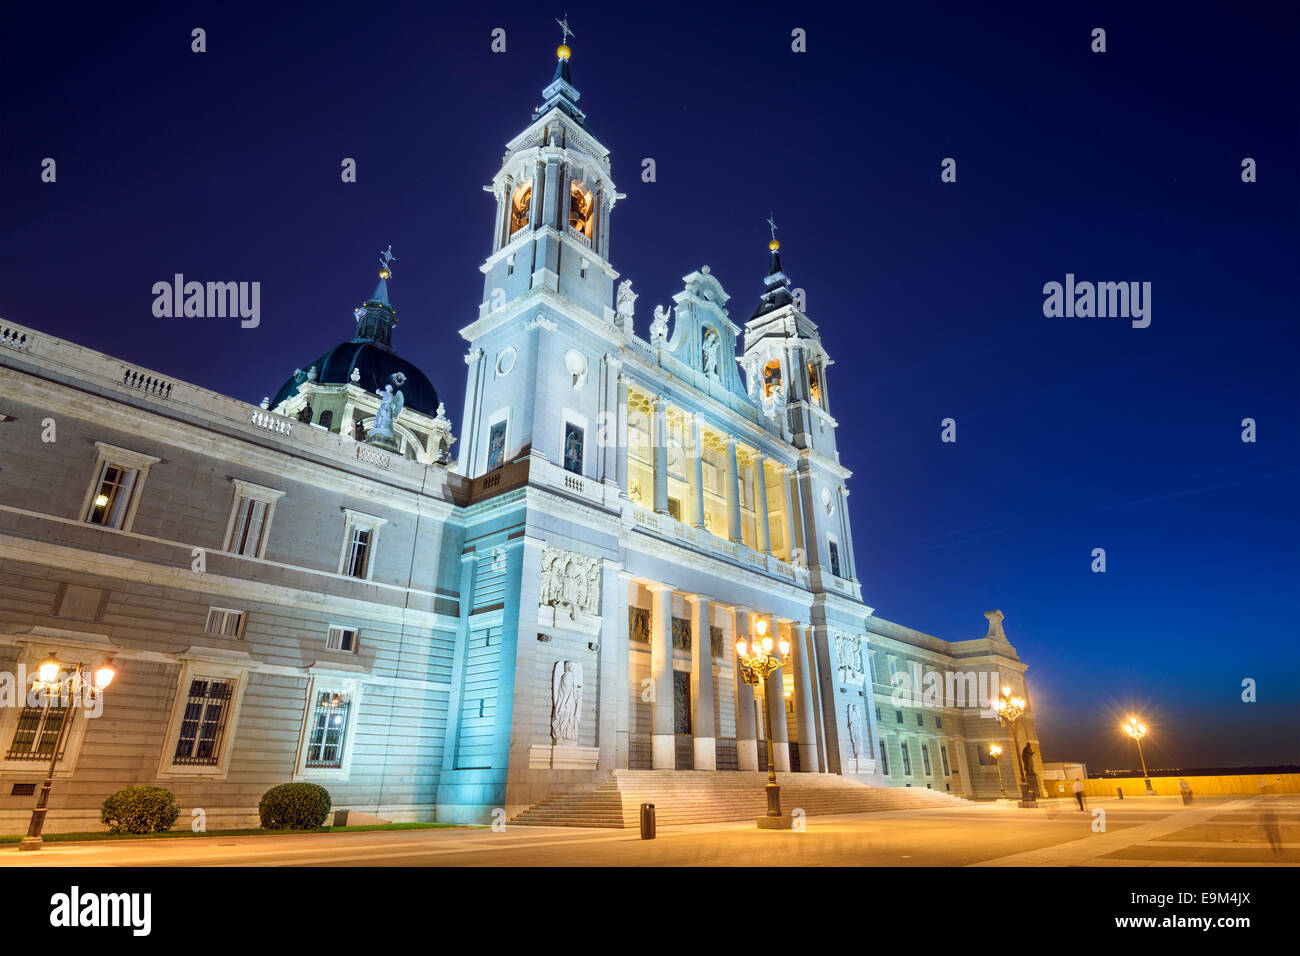 Madrid, Spanien in La Almudena-Kathedrale in der Nacht. Stockbild